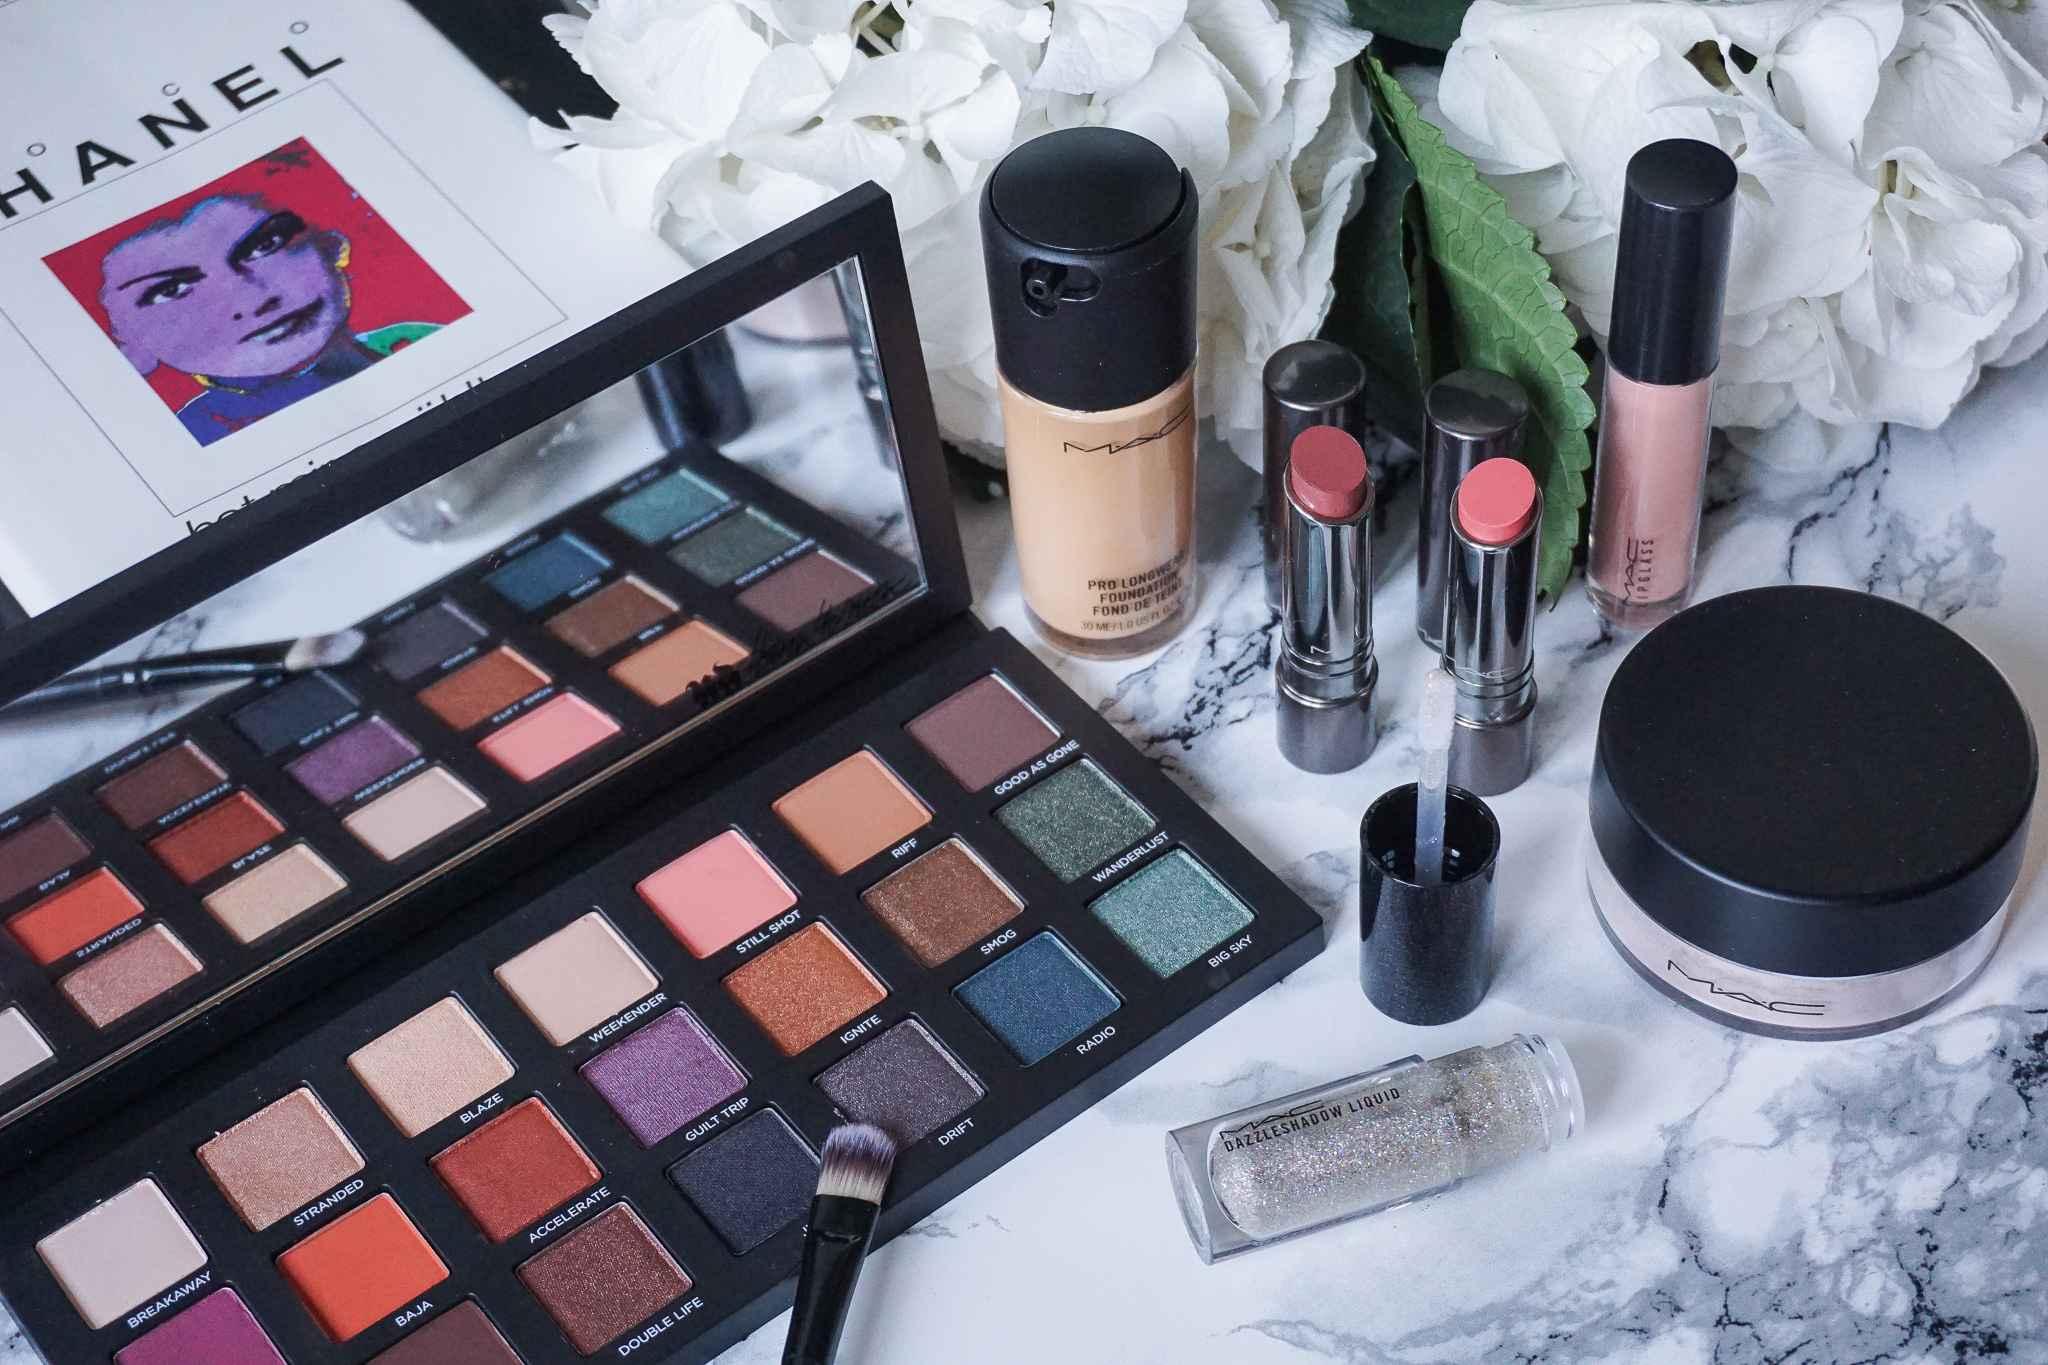 makeup review maccosmetics urban decay